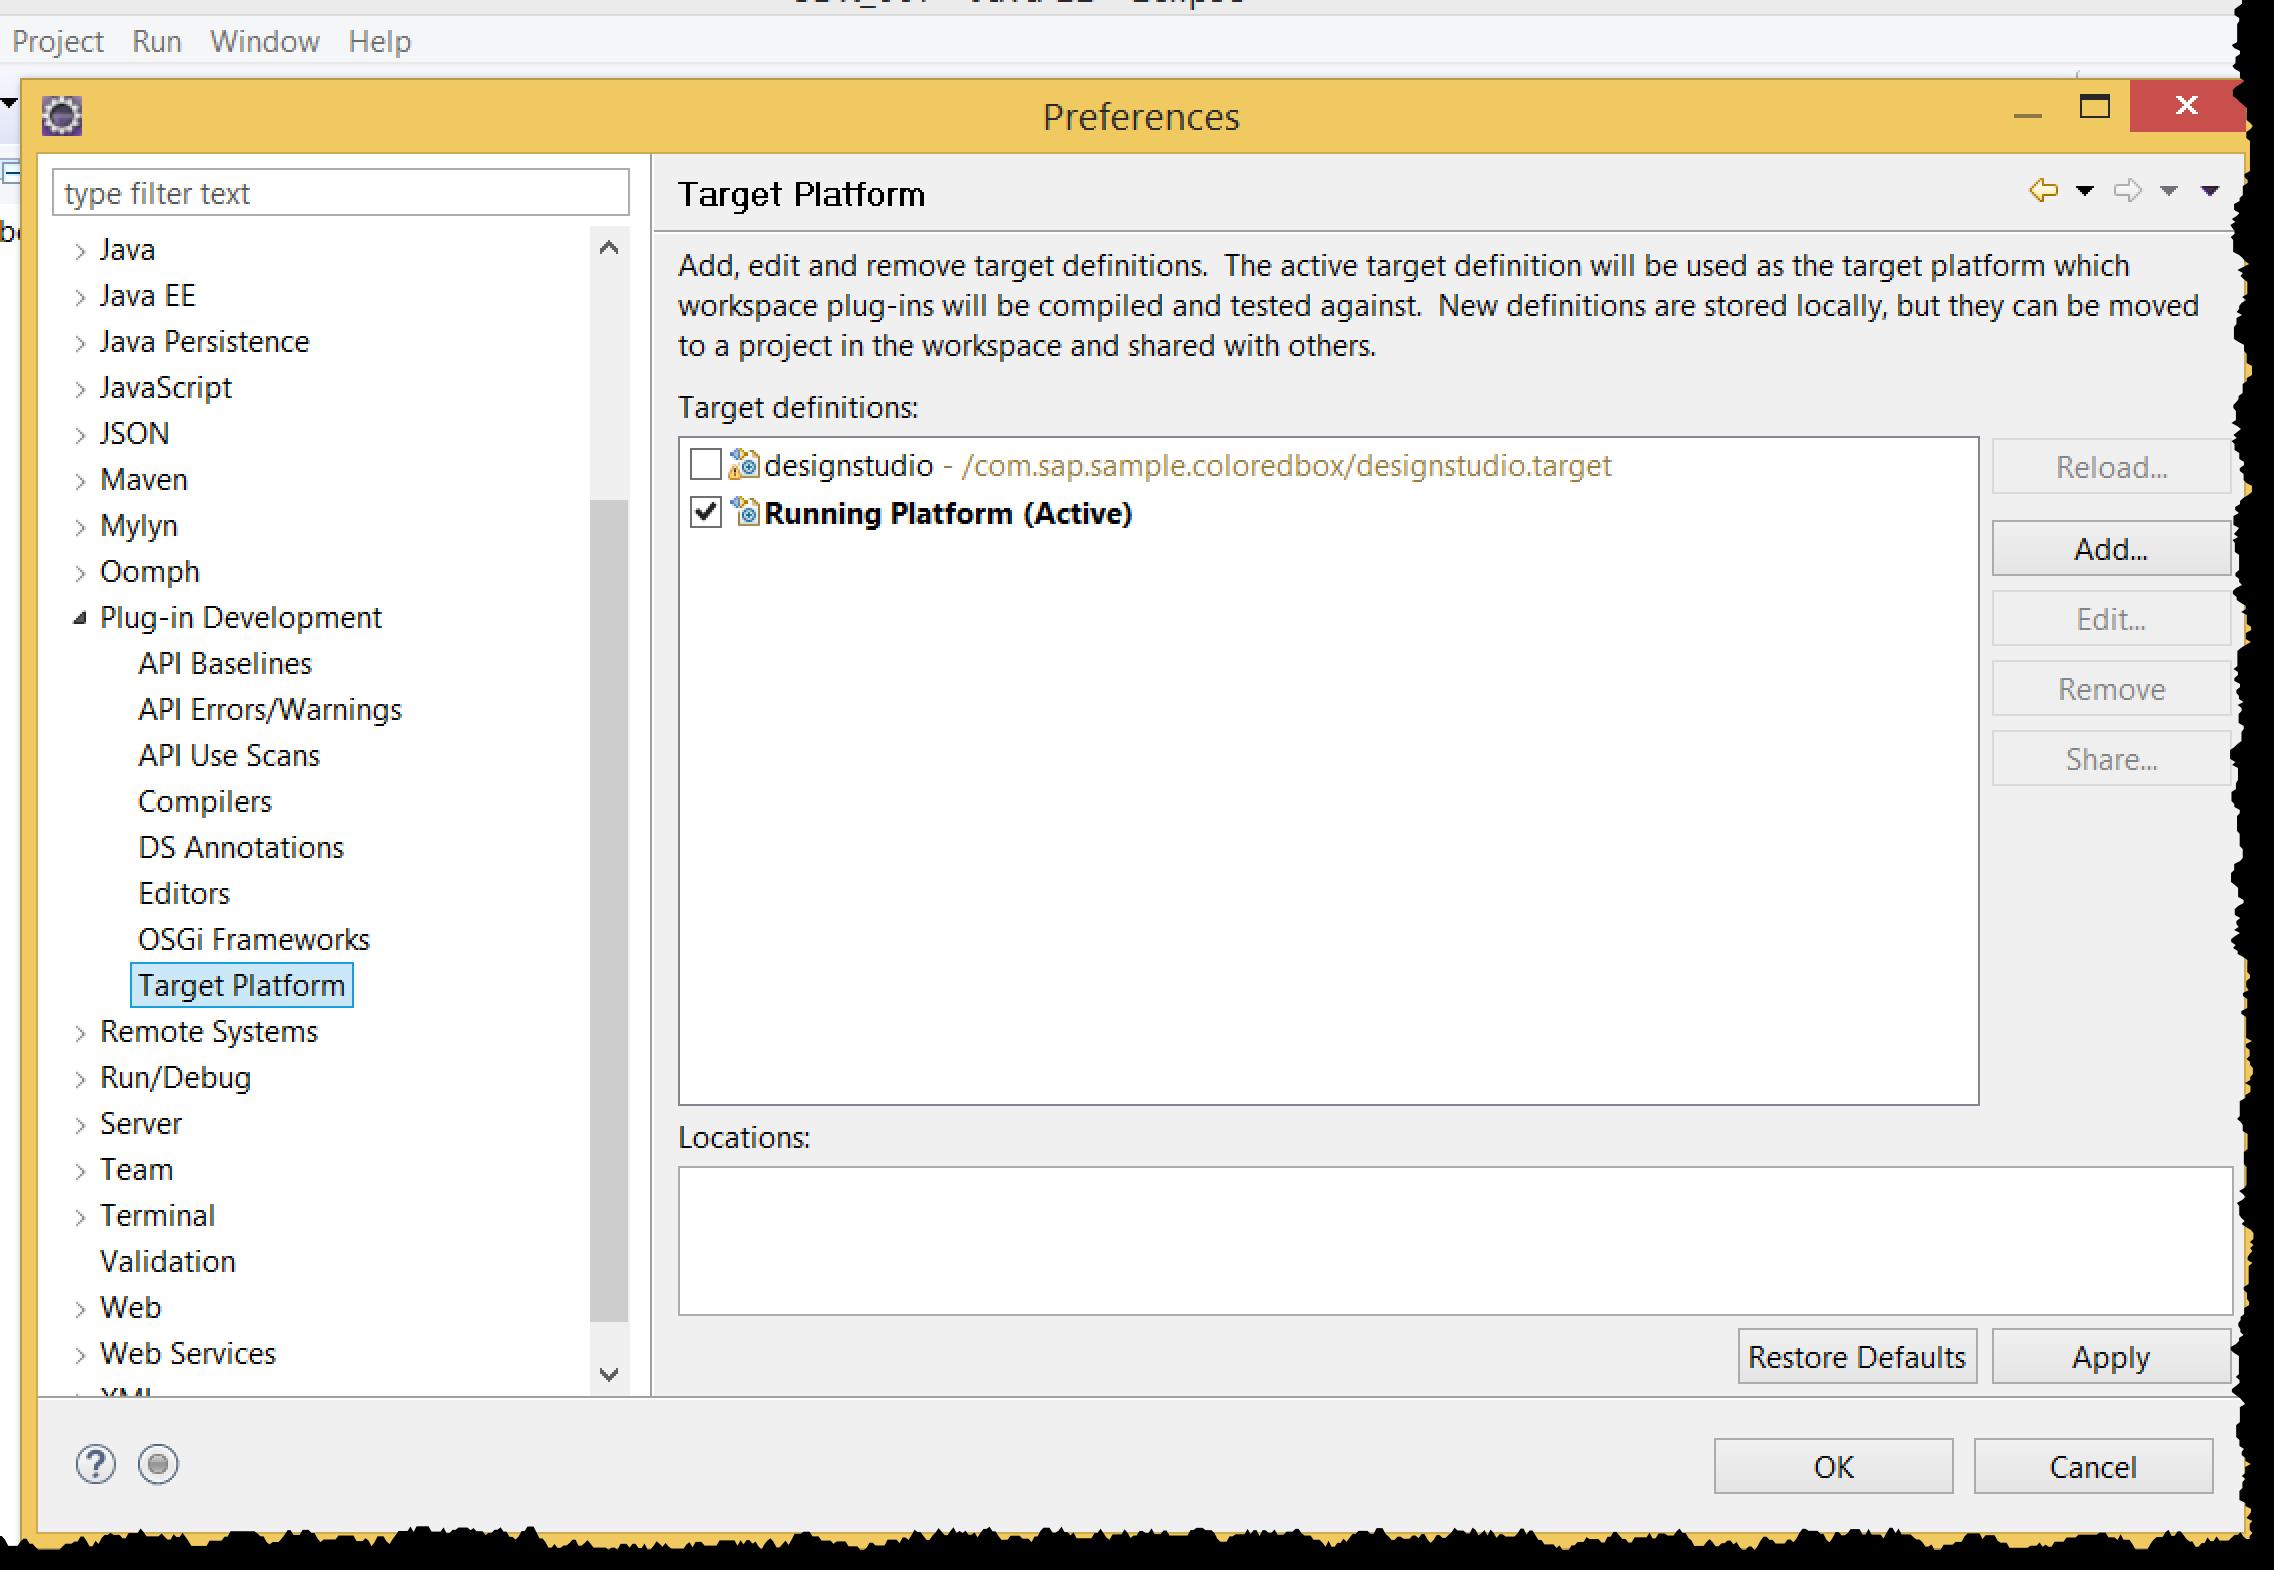 Design Studio 1 6 – Execute the sample project | SAP Blogs